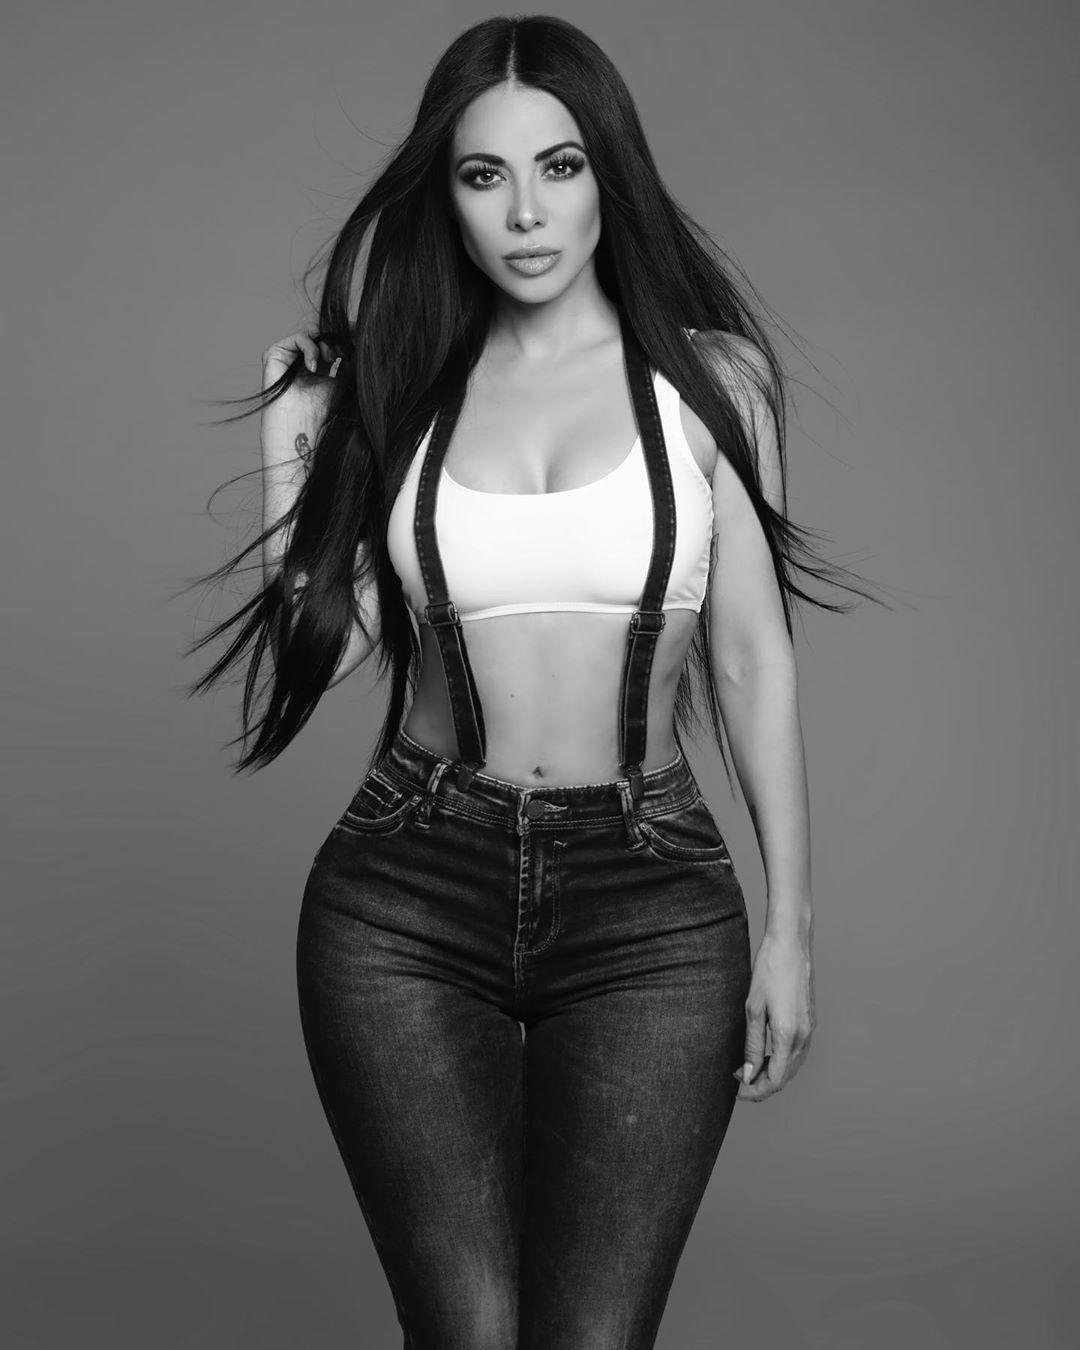 Stunning choice for Jimena Sanchez, Skin Tight